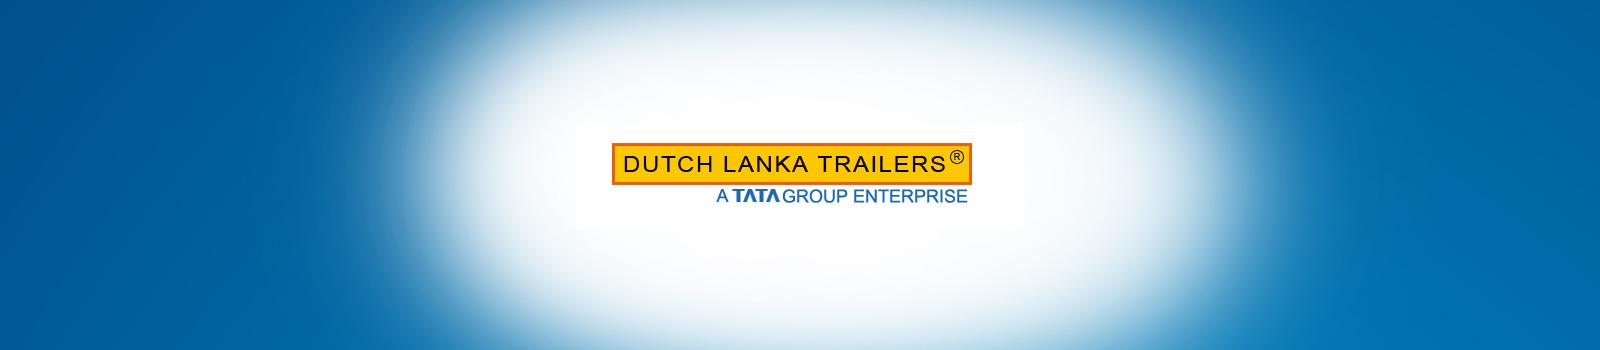 Dutch Lanka Trailer Manufacturers Ltd (DLT), Sri Lanka